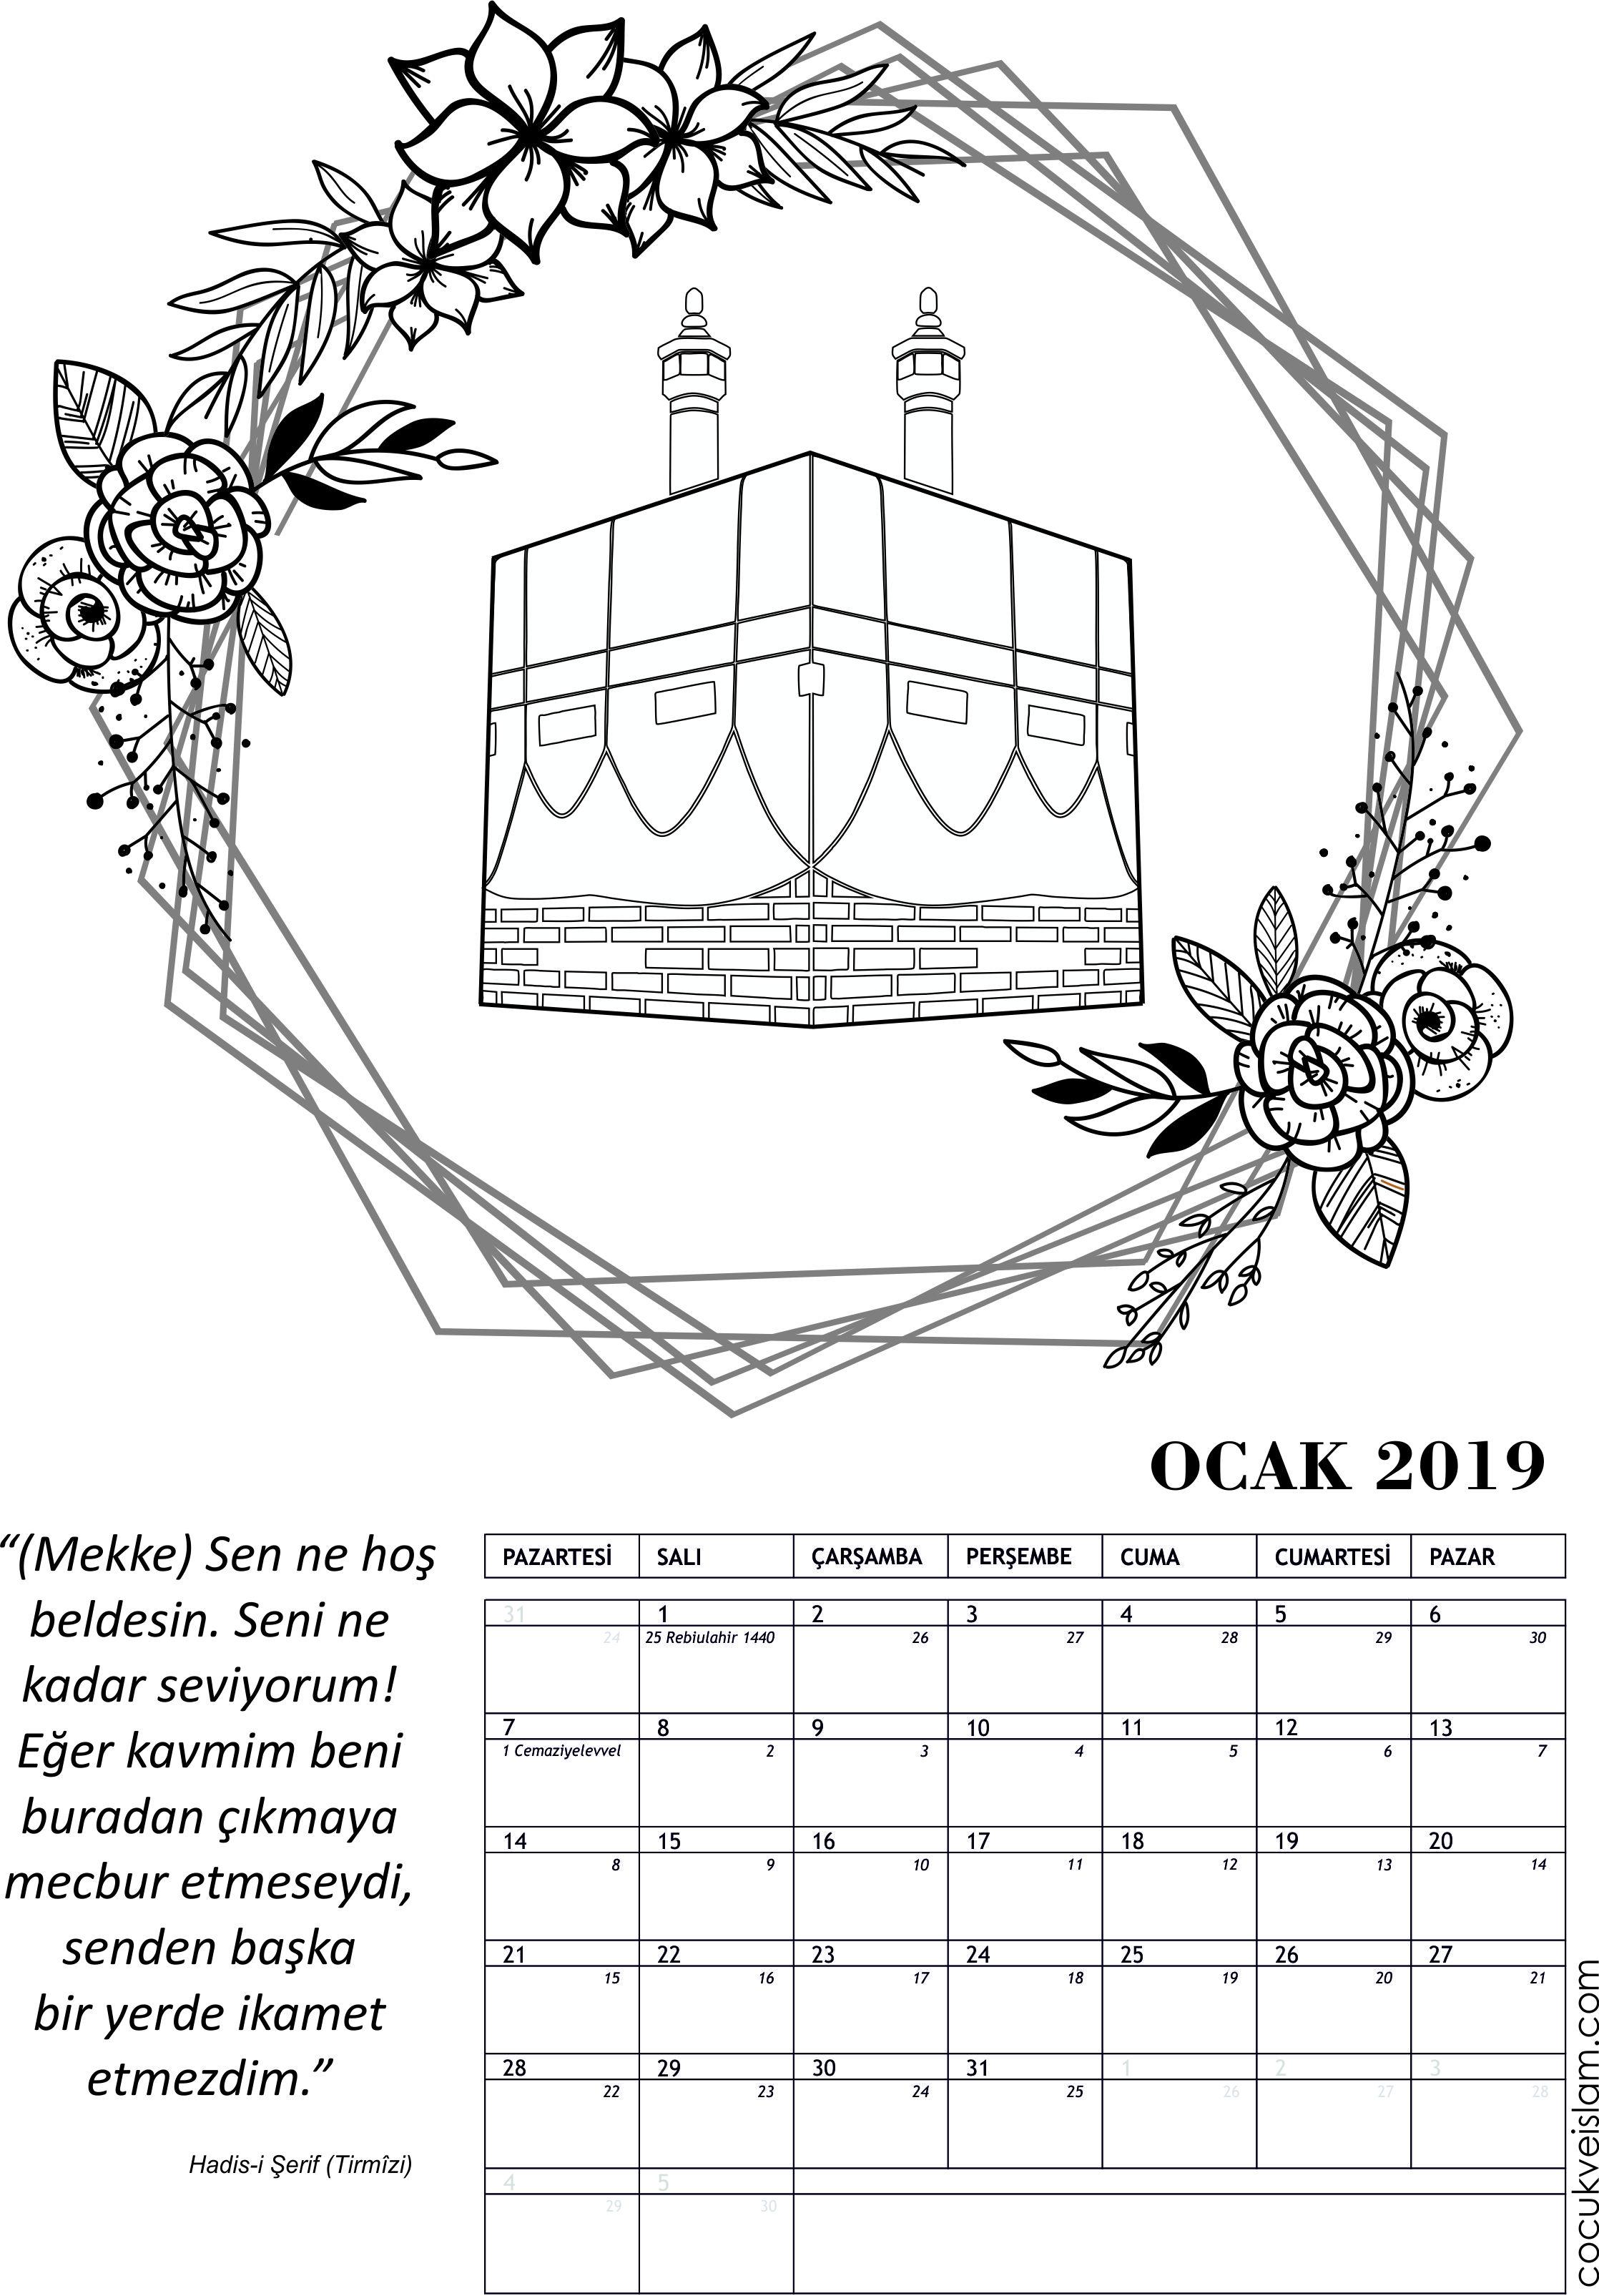 Ocak 2019 Tema Mekke Nin Fethi Cocuk Ve Islam